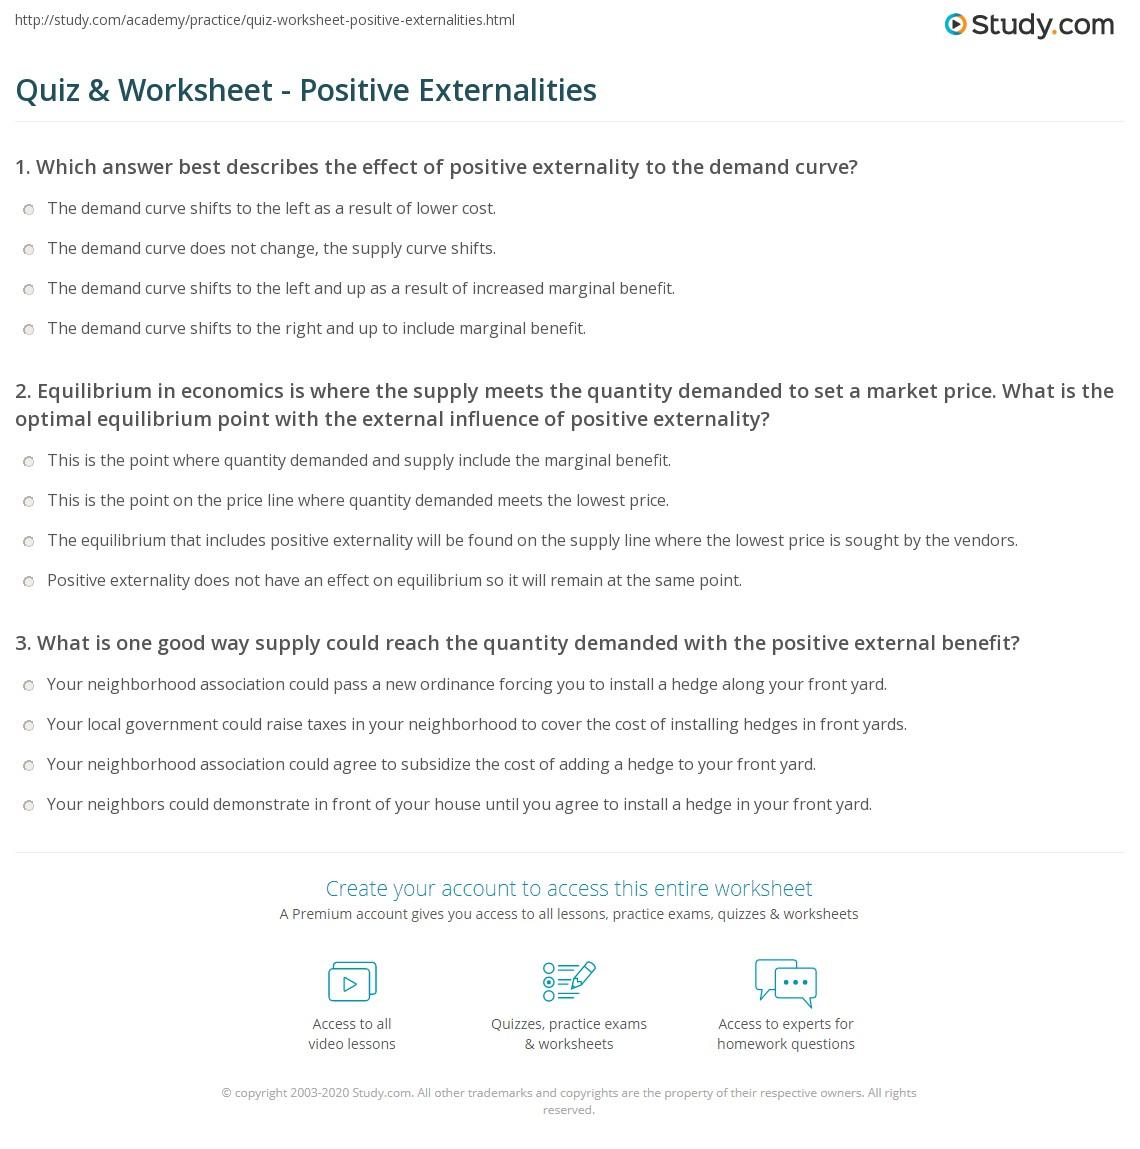 quiz worksheet positive externalities. Black Bedroom Furniture Sets. Home Design Ideas